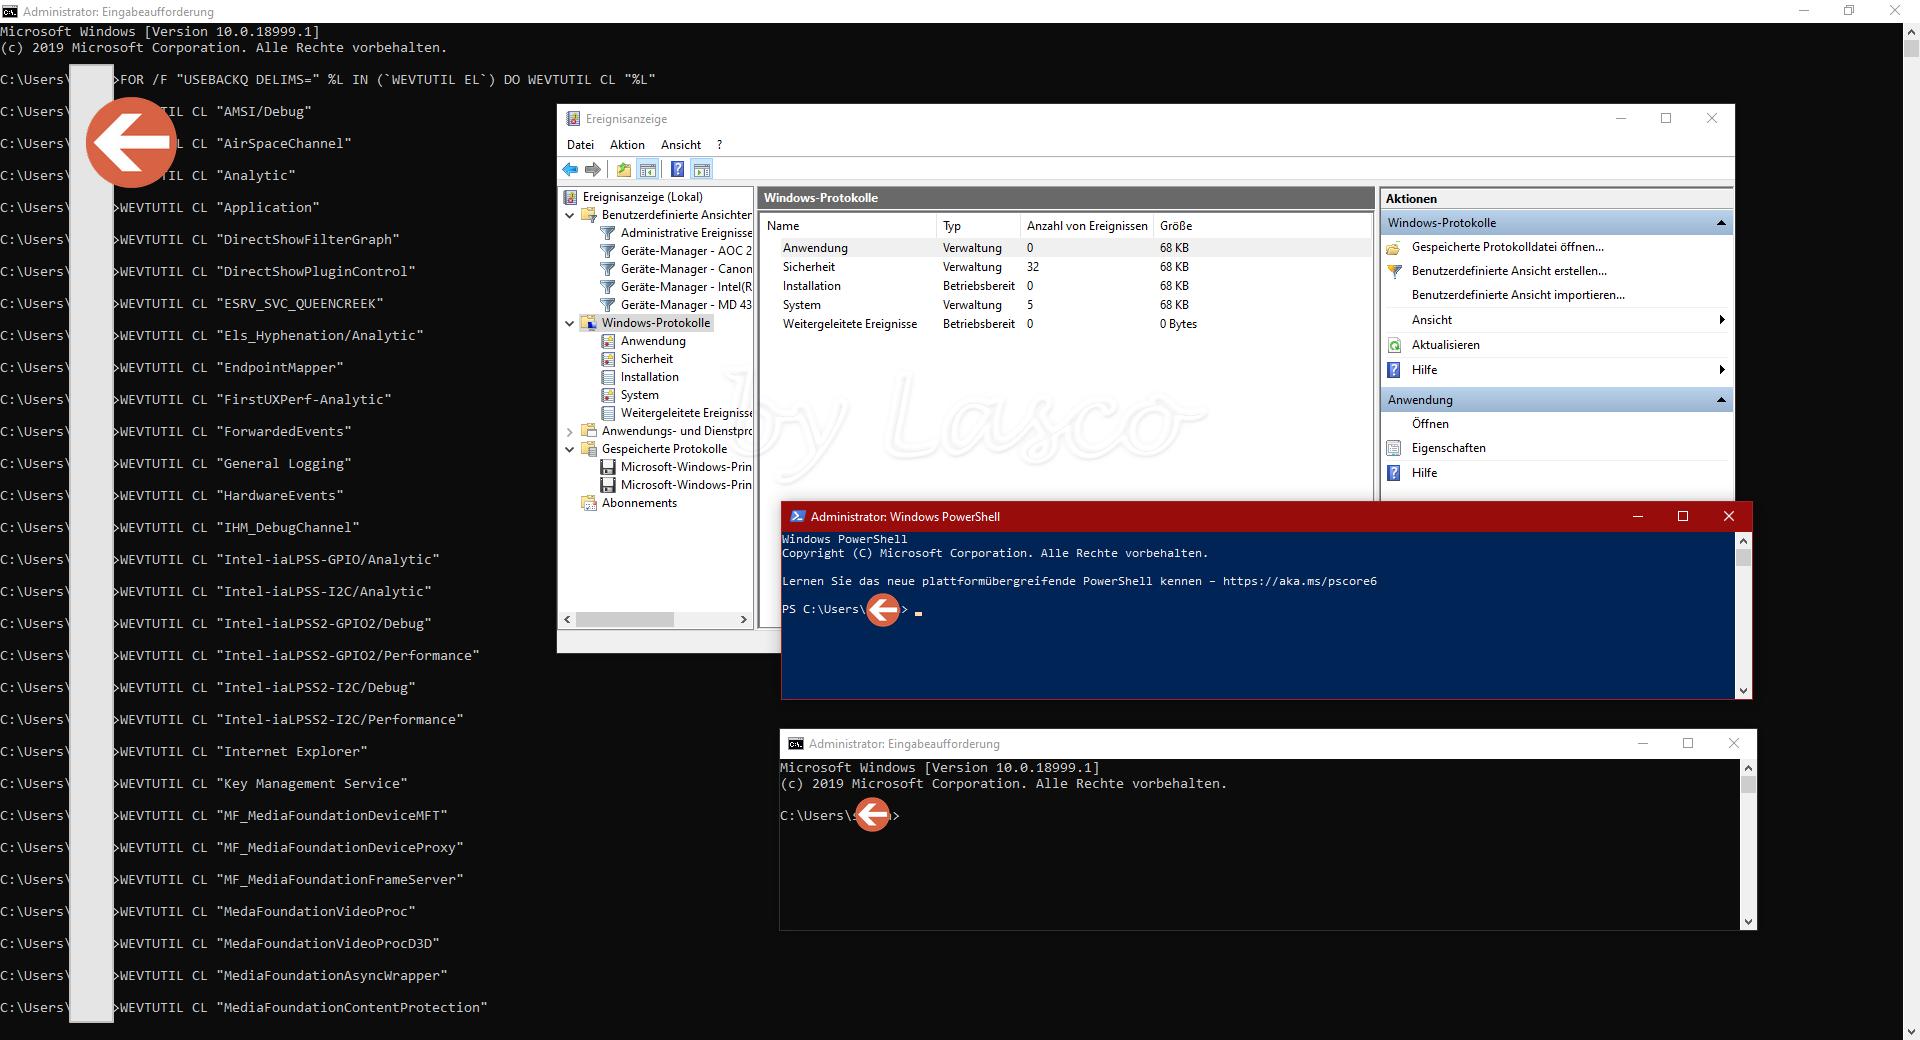 Windows-10-Insider-18999.1_Benutzer-Manager-Error.png